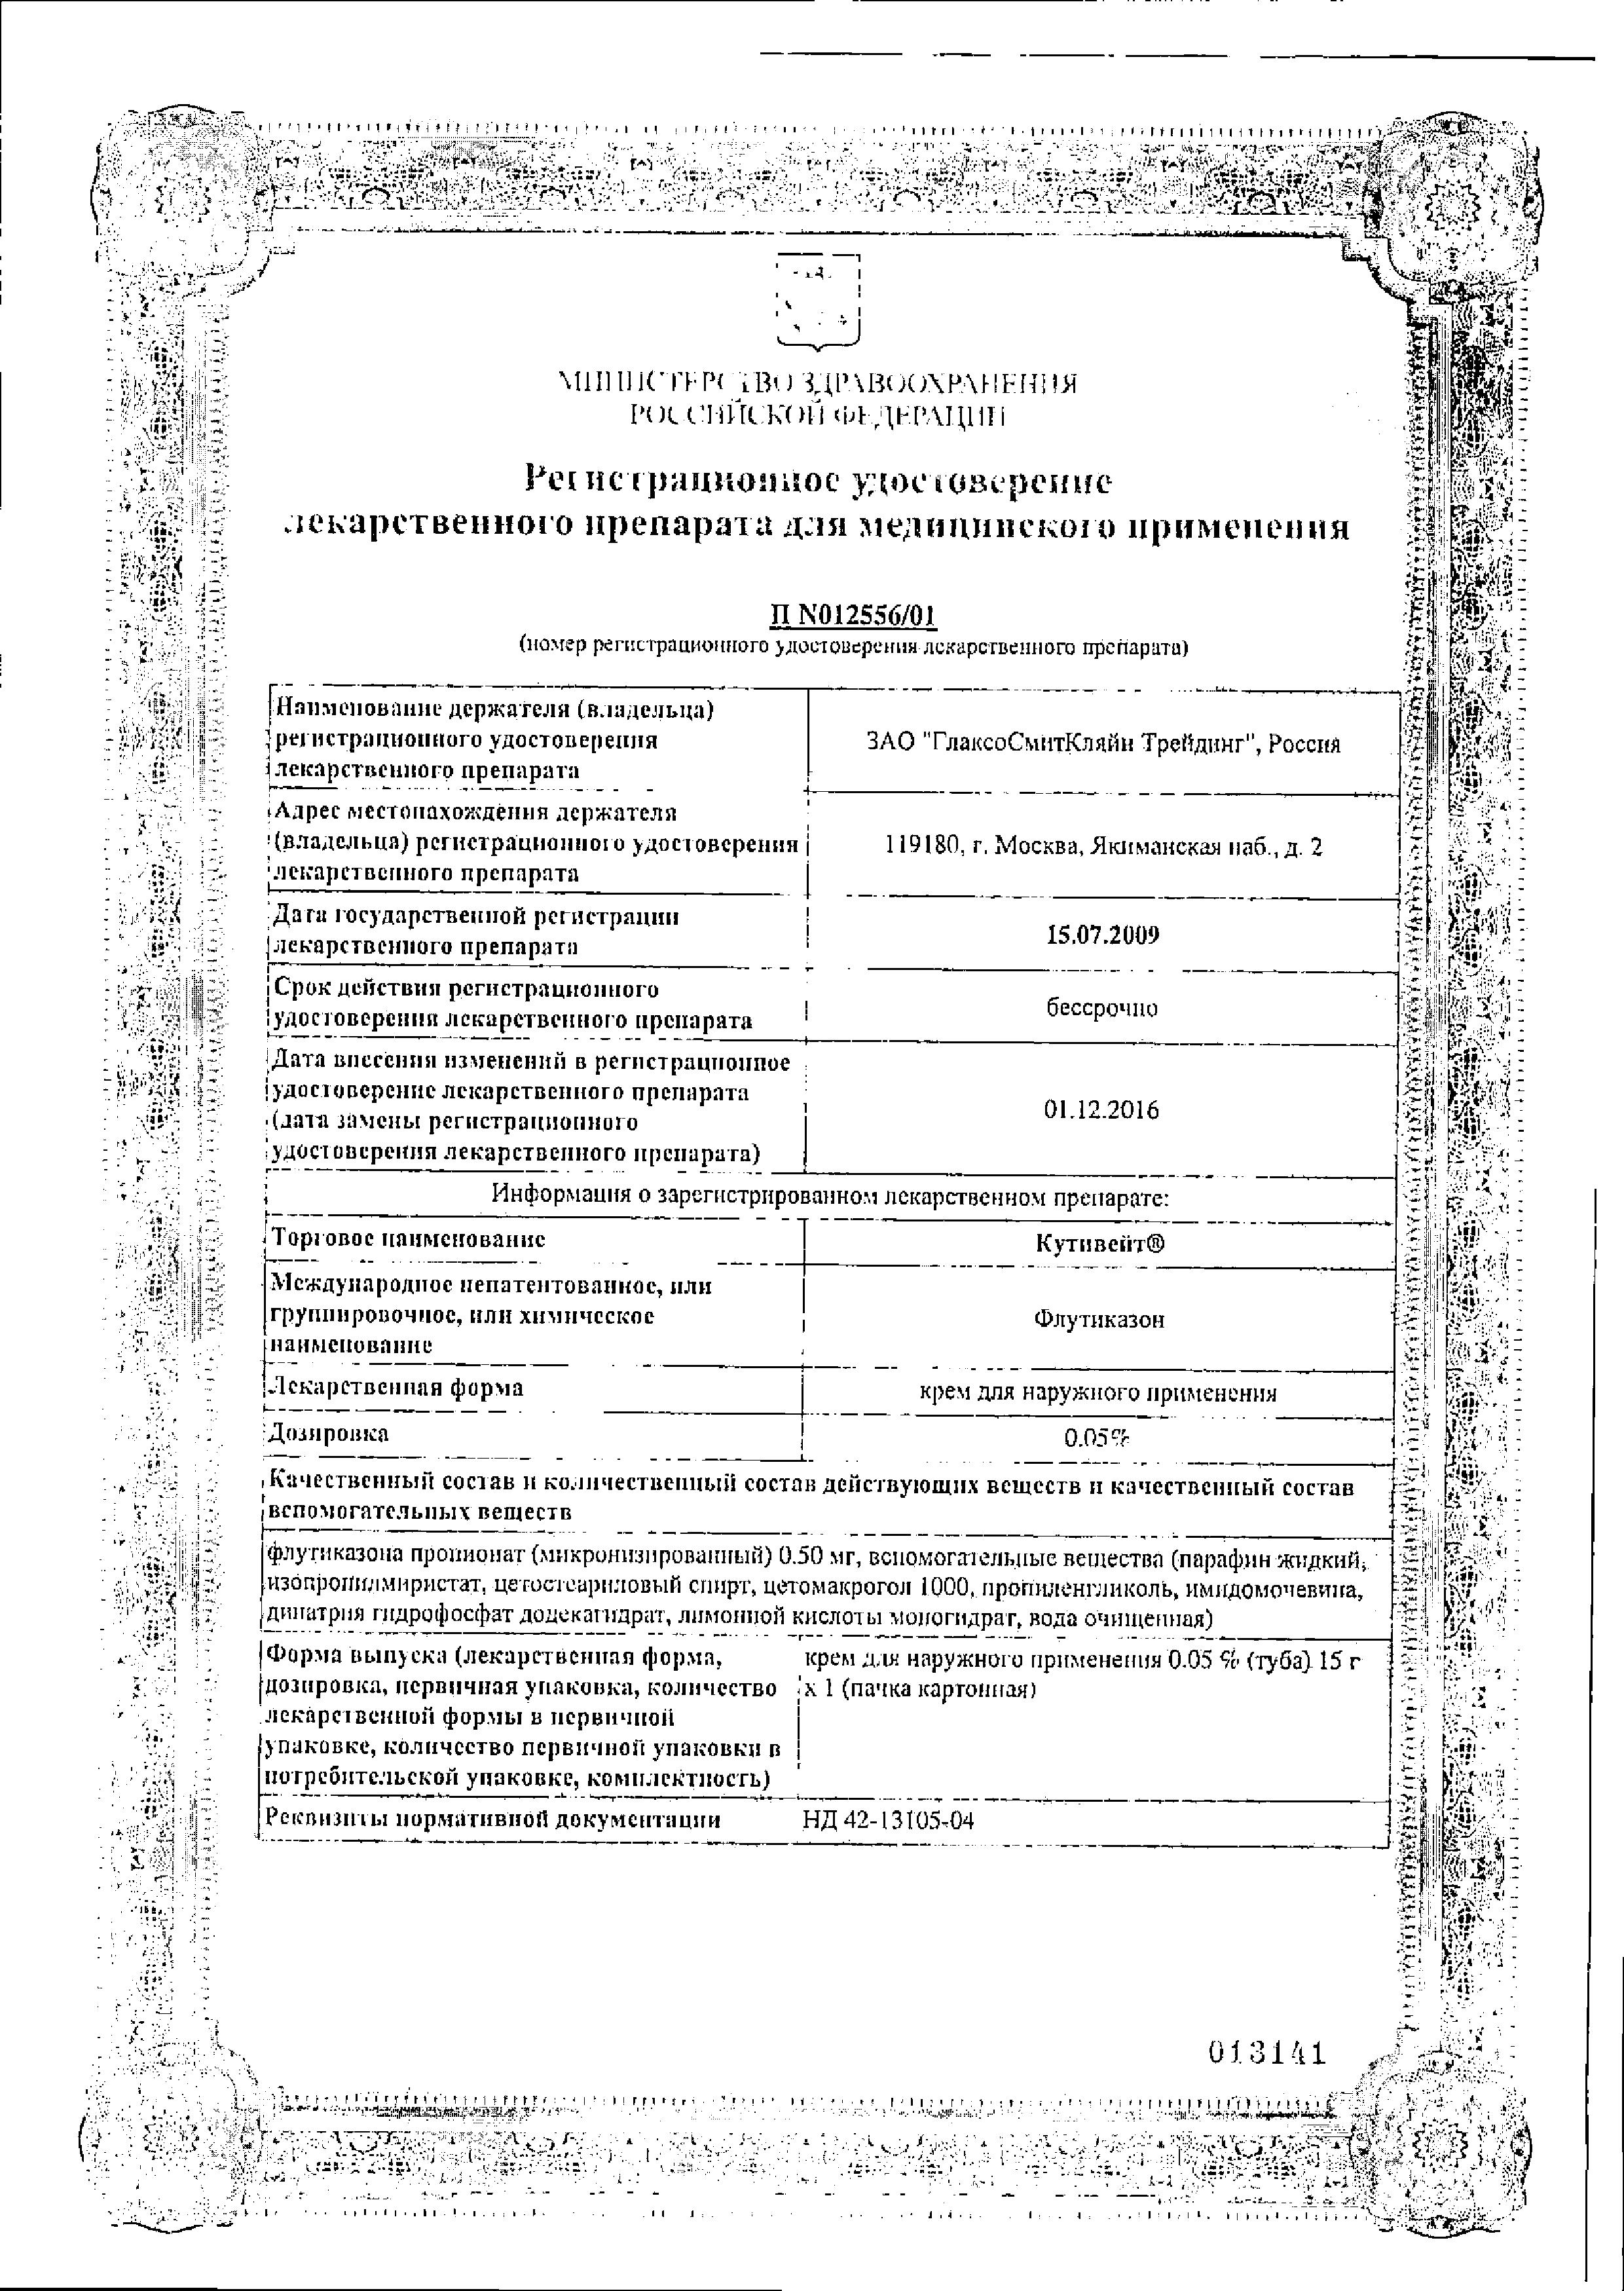 Кутивейт сертификат